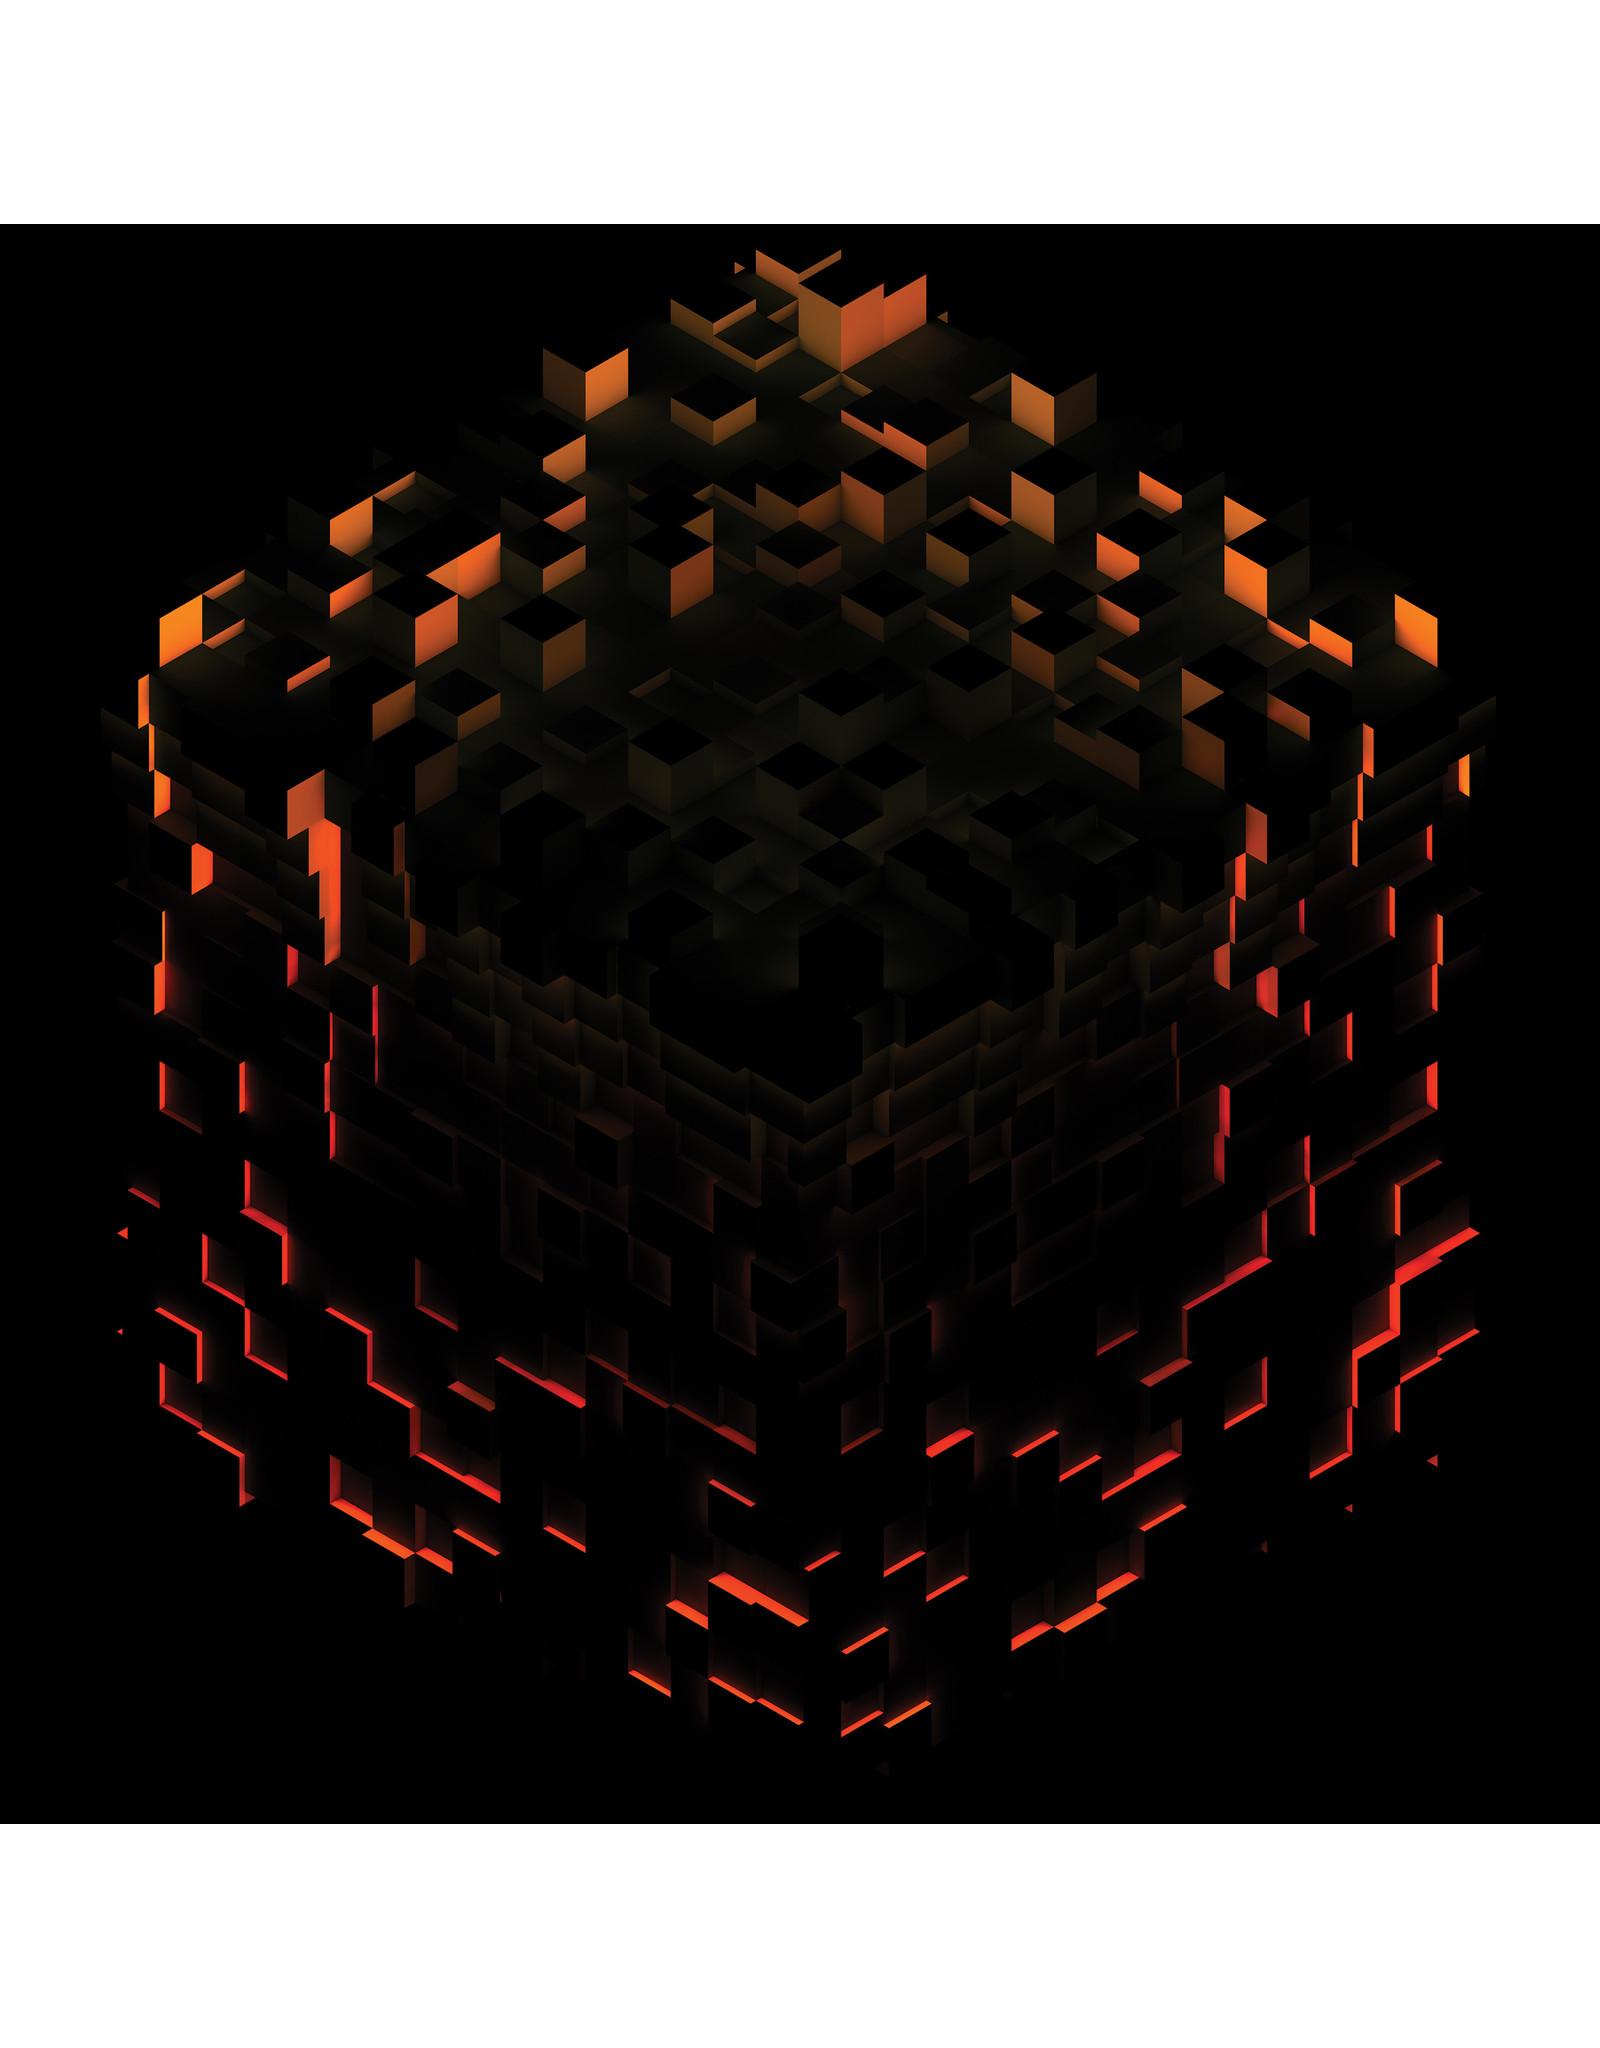 New Vinyl C418 - Minecraft Volume Beta (Colored) 2LP